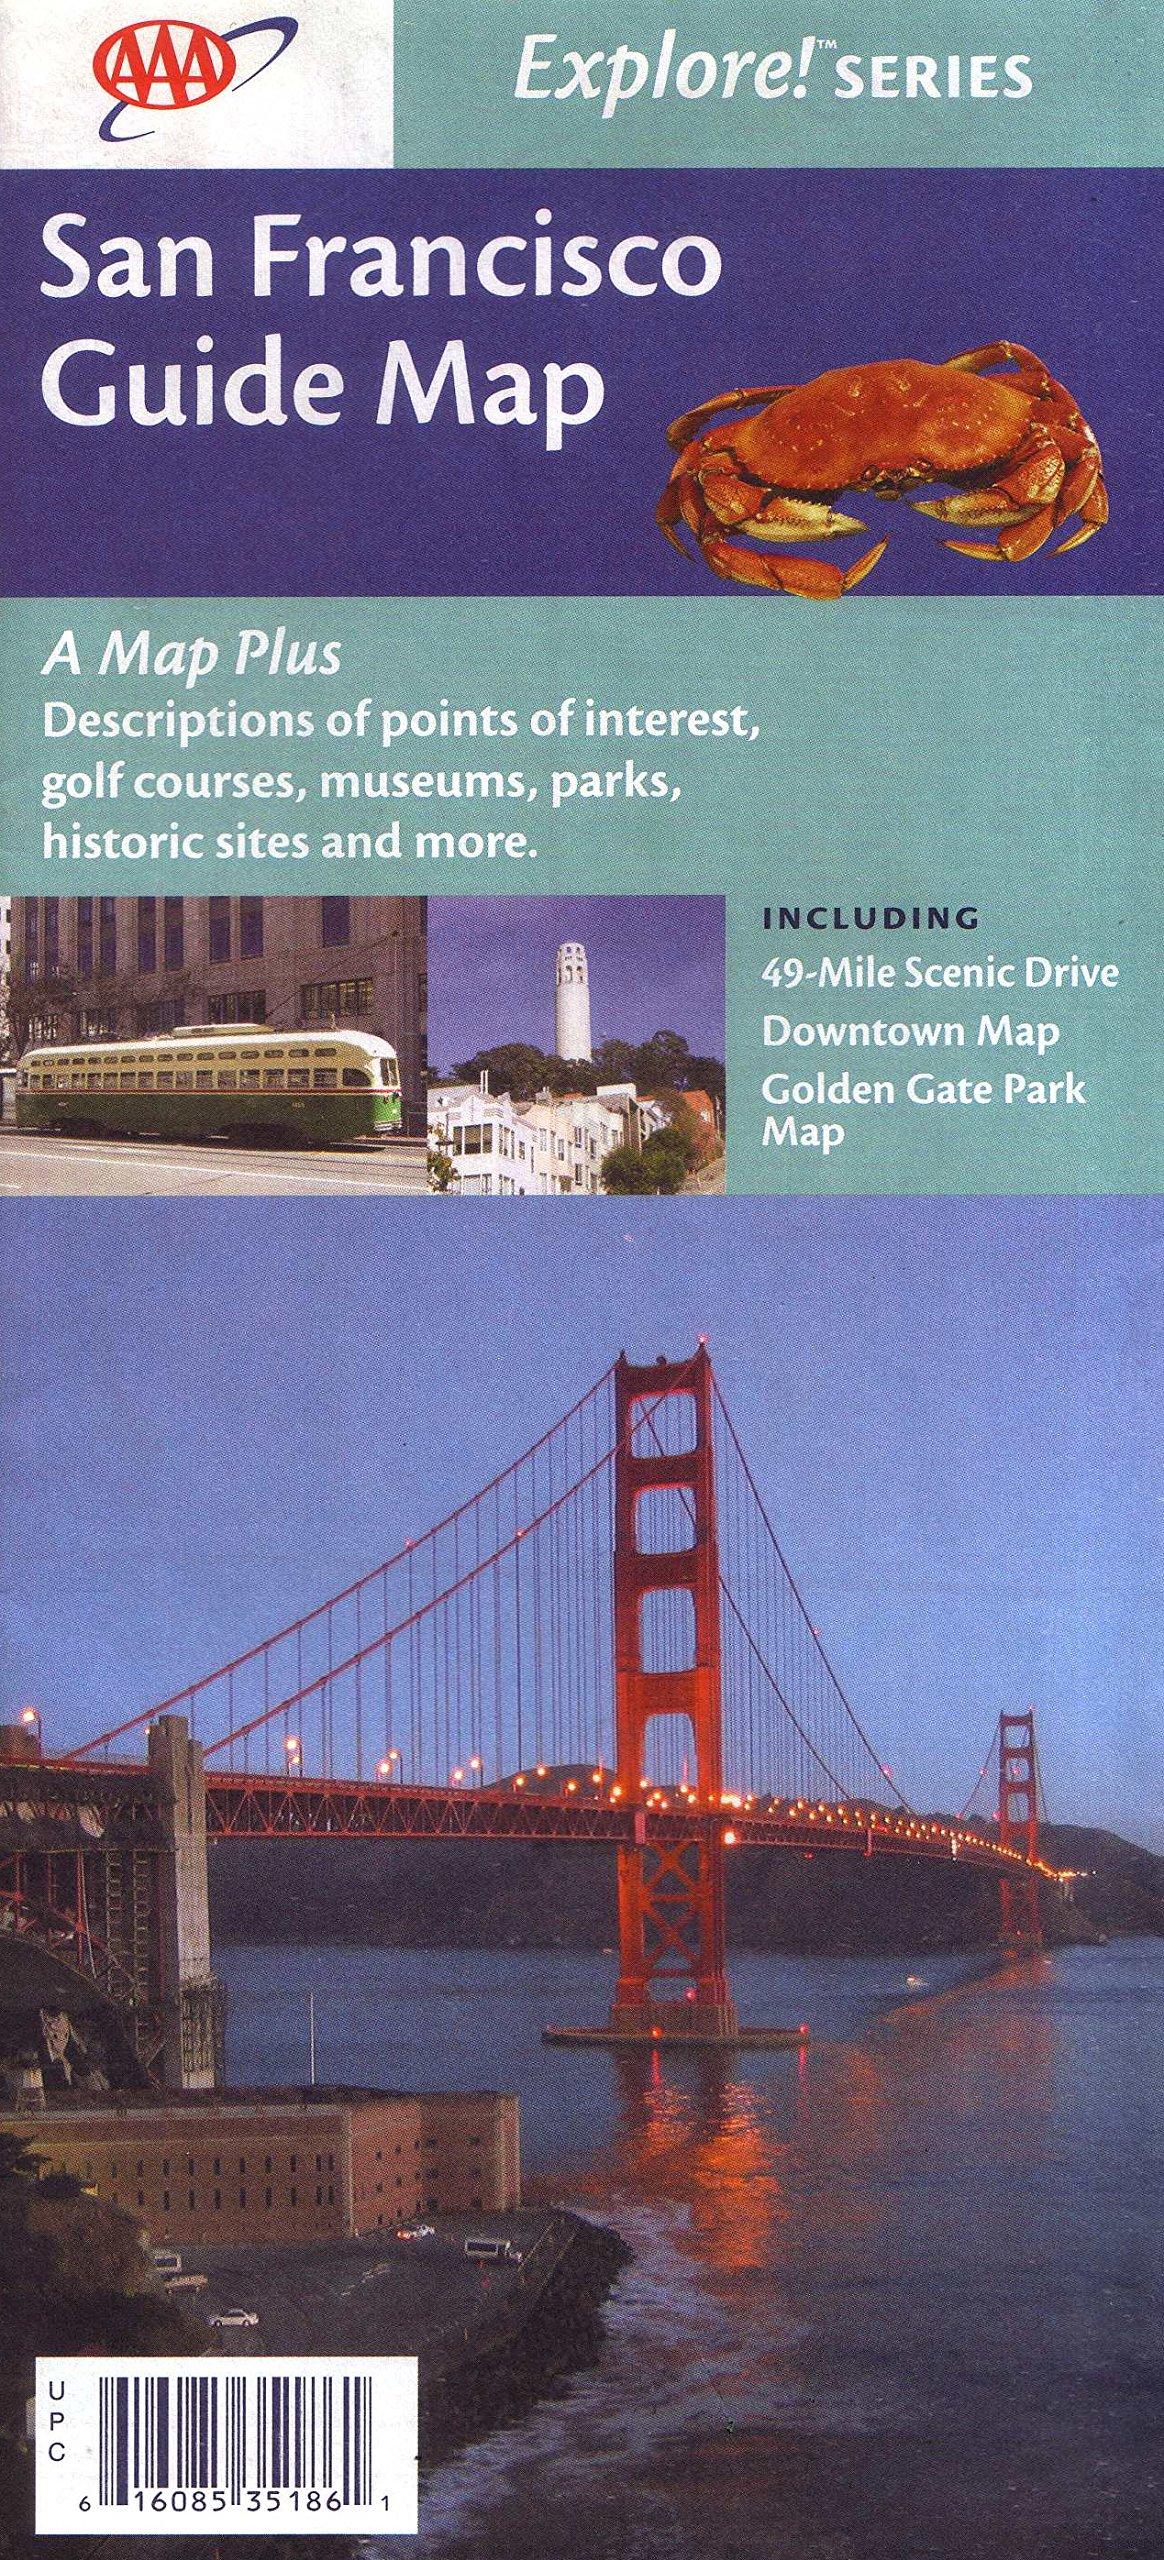 San Francisco Guide Map (Explore! Series) pdf